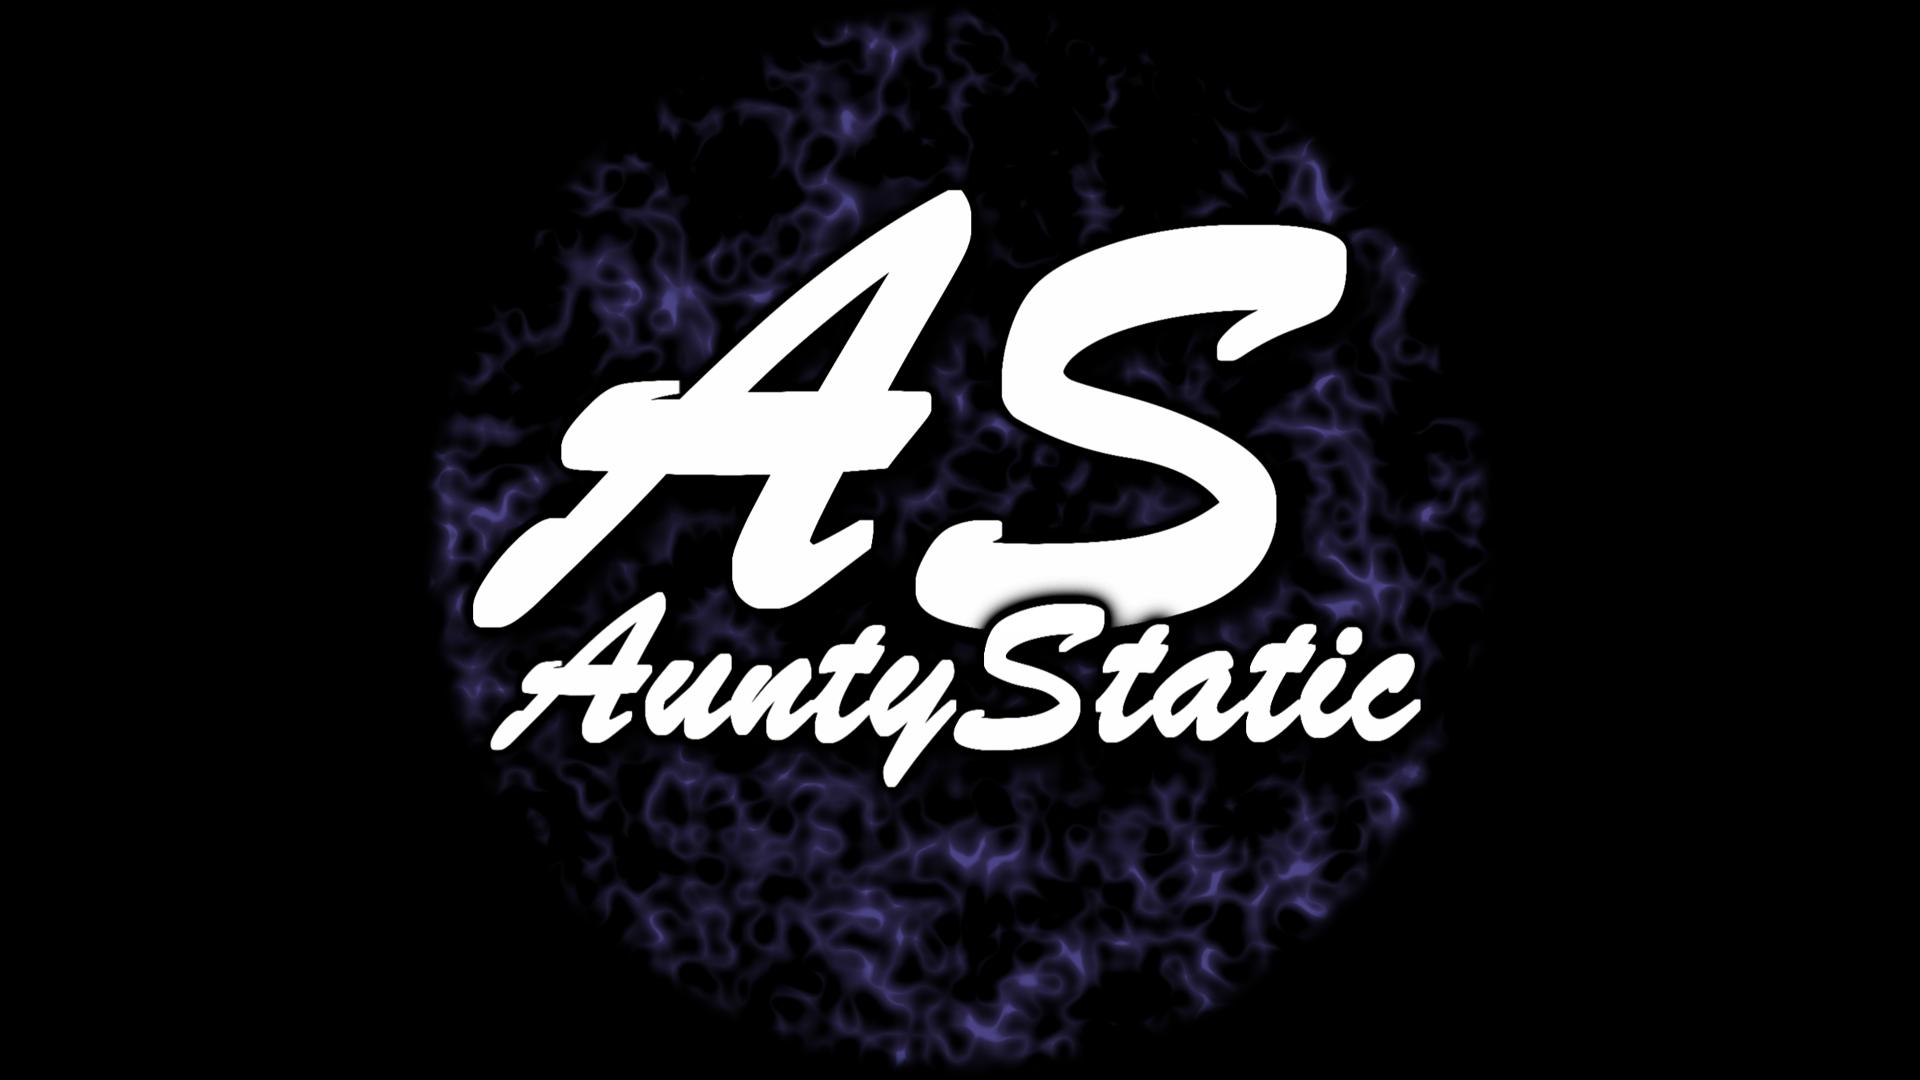 Auntystatic